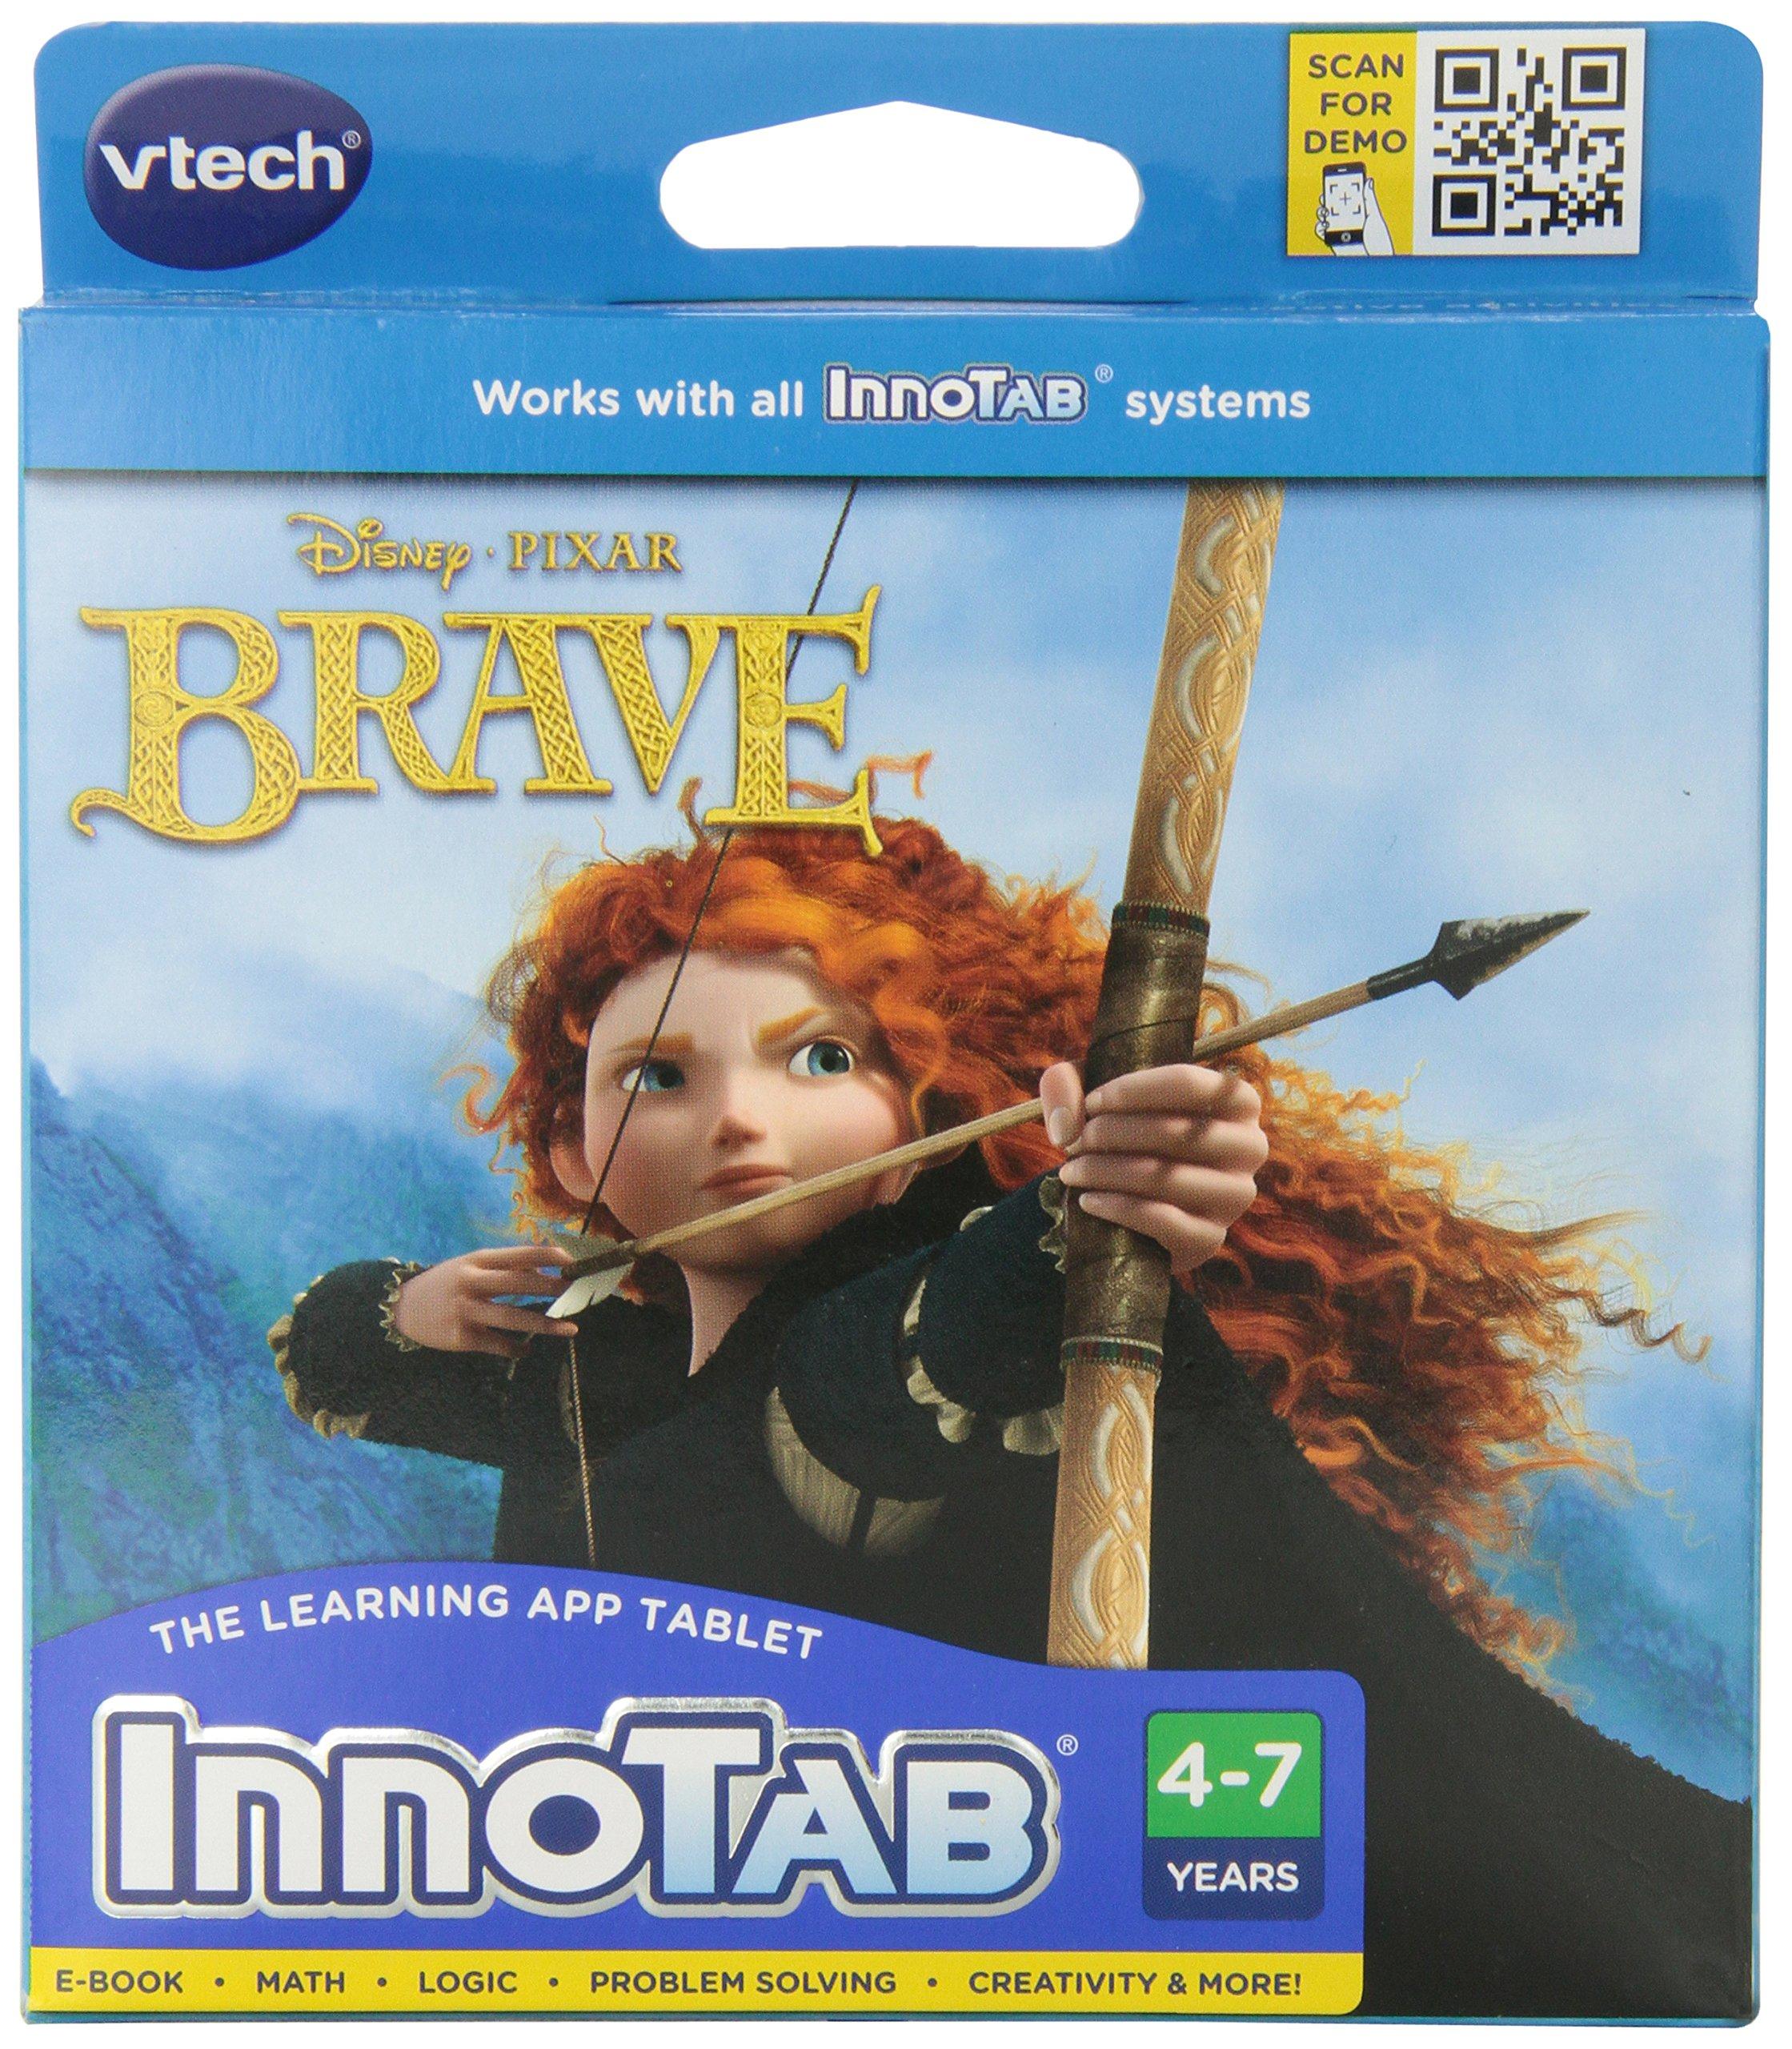 VTech InnoTab Software - Brave by VTech